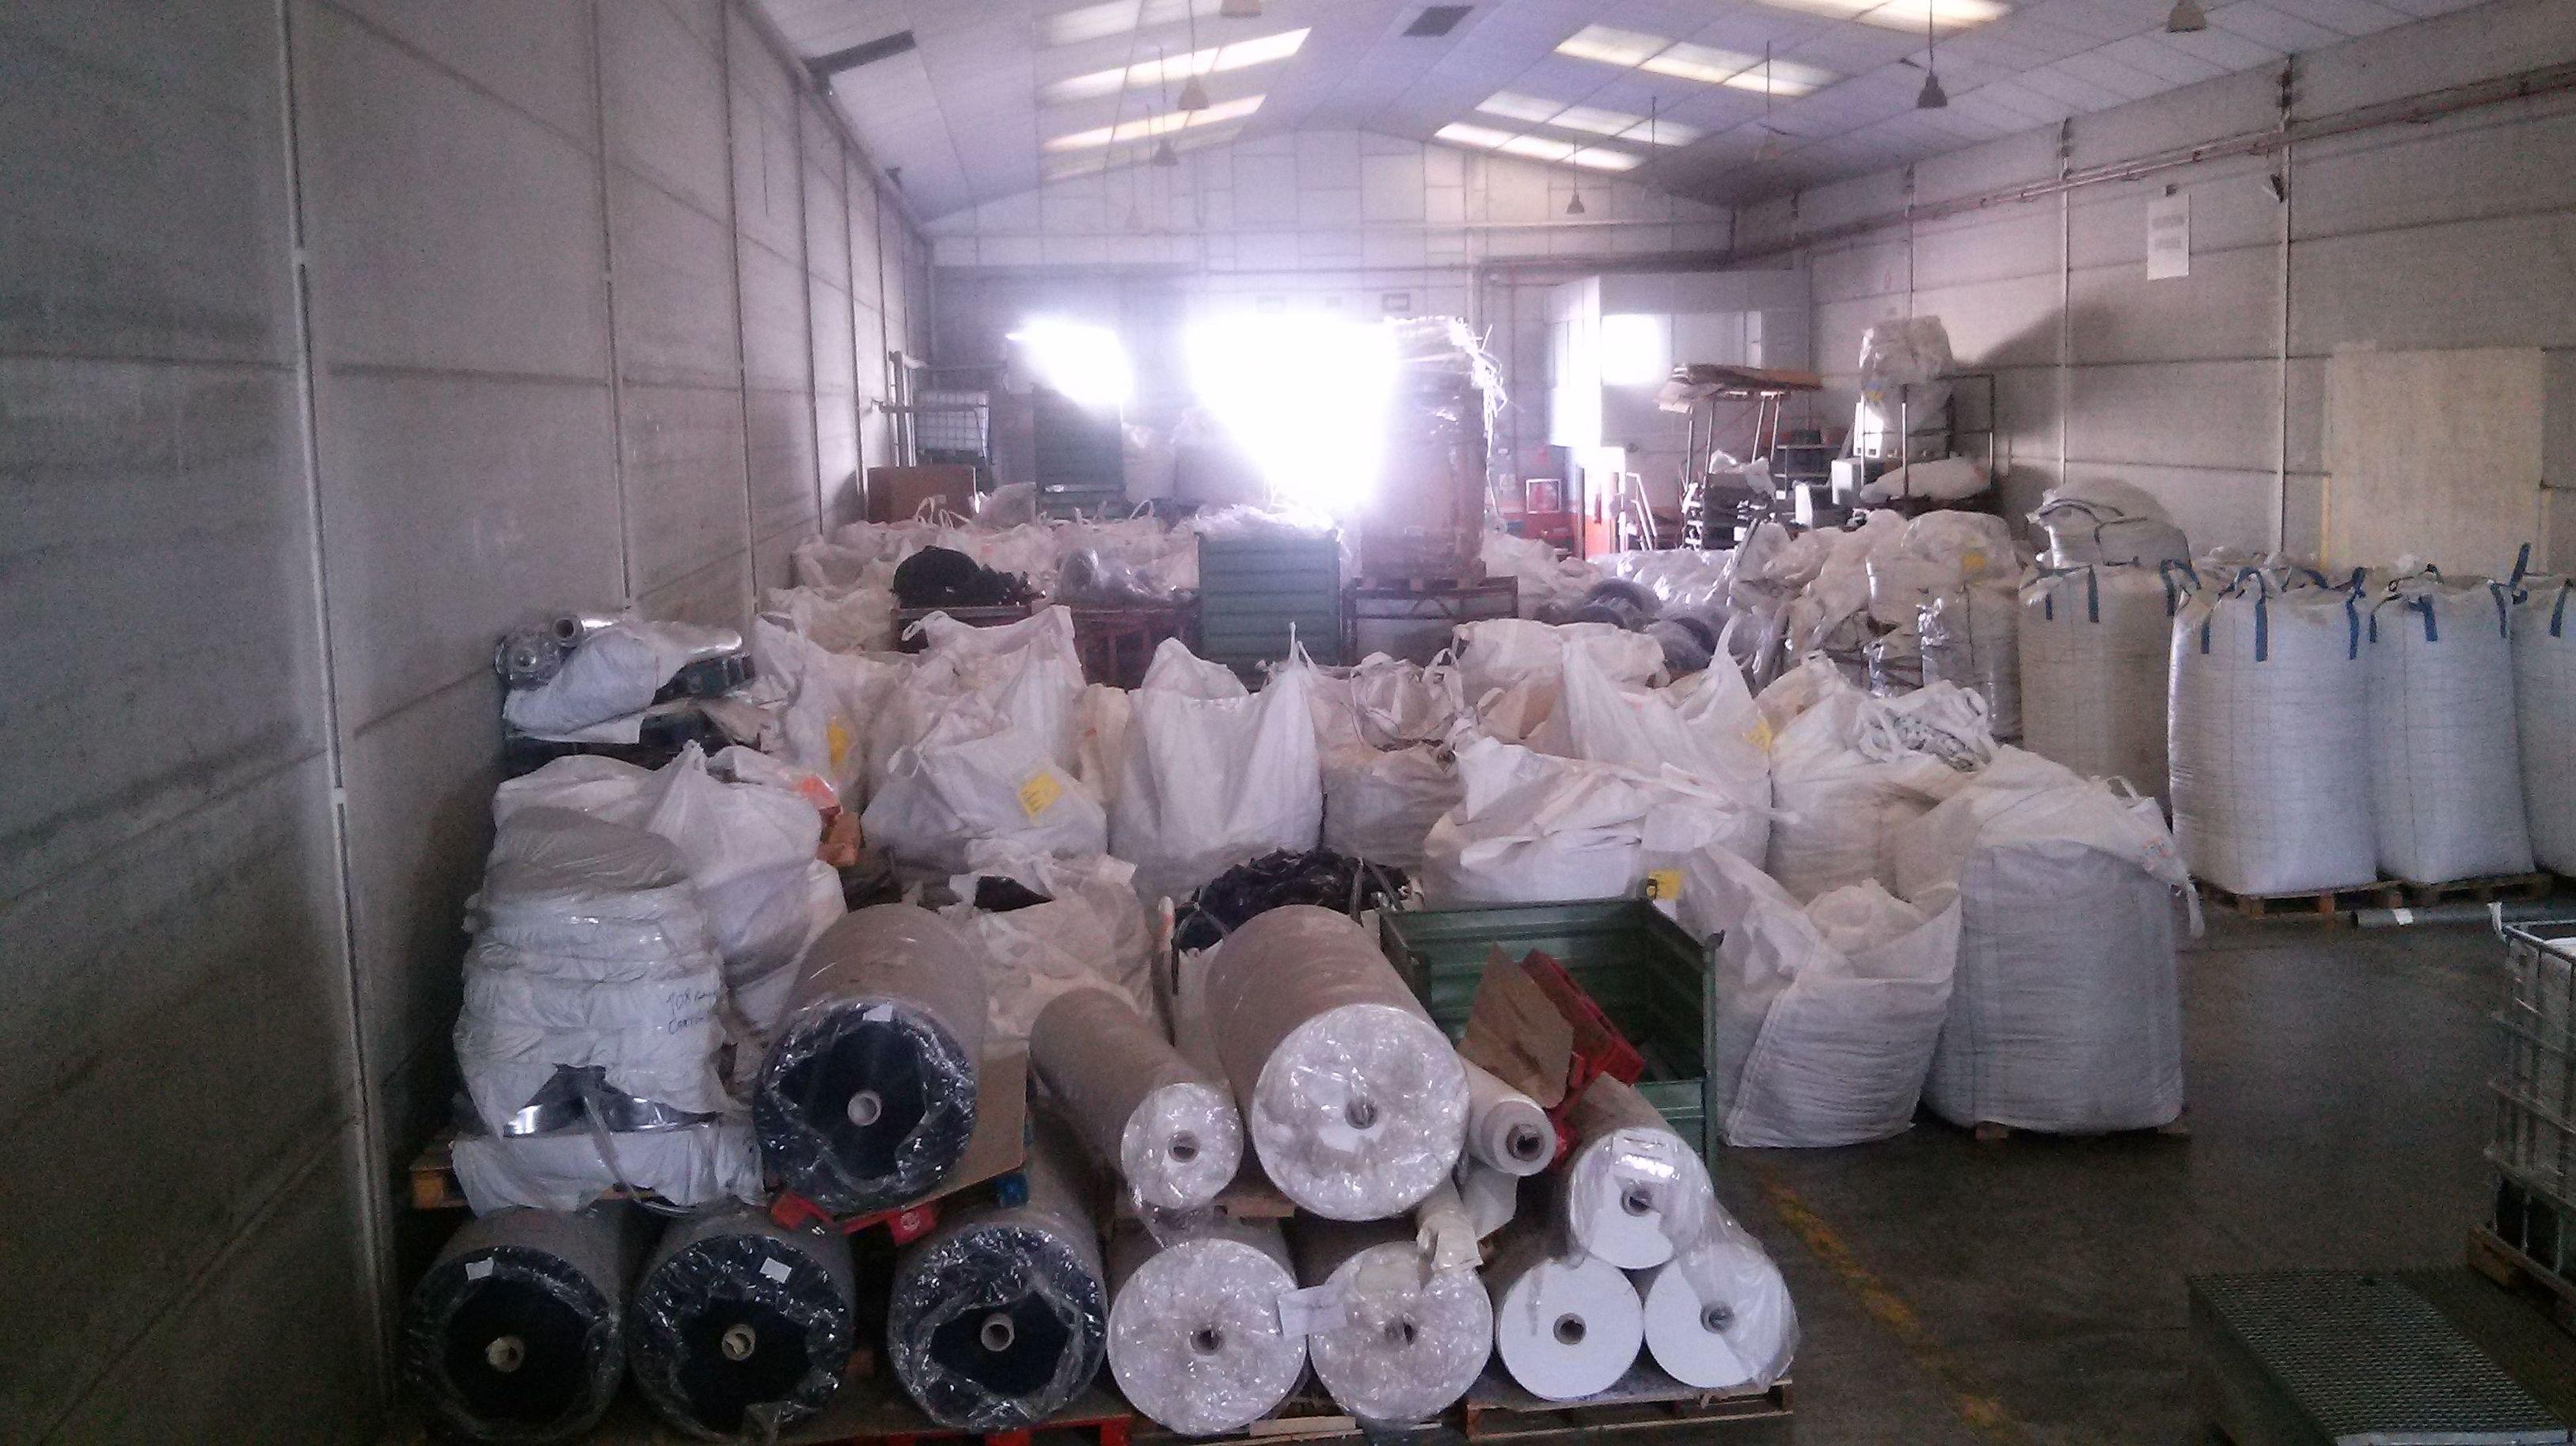 Foto 21 de Reciclaje de residuos en Manises | PalePlast, S. L.